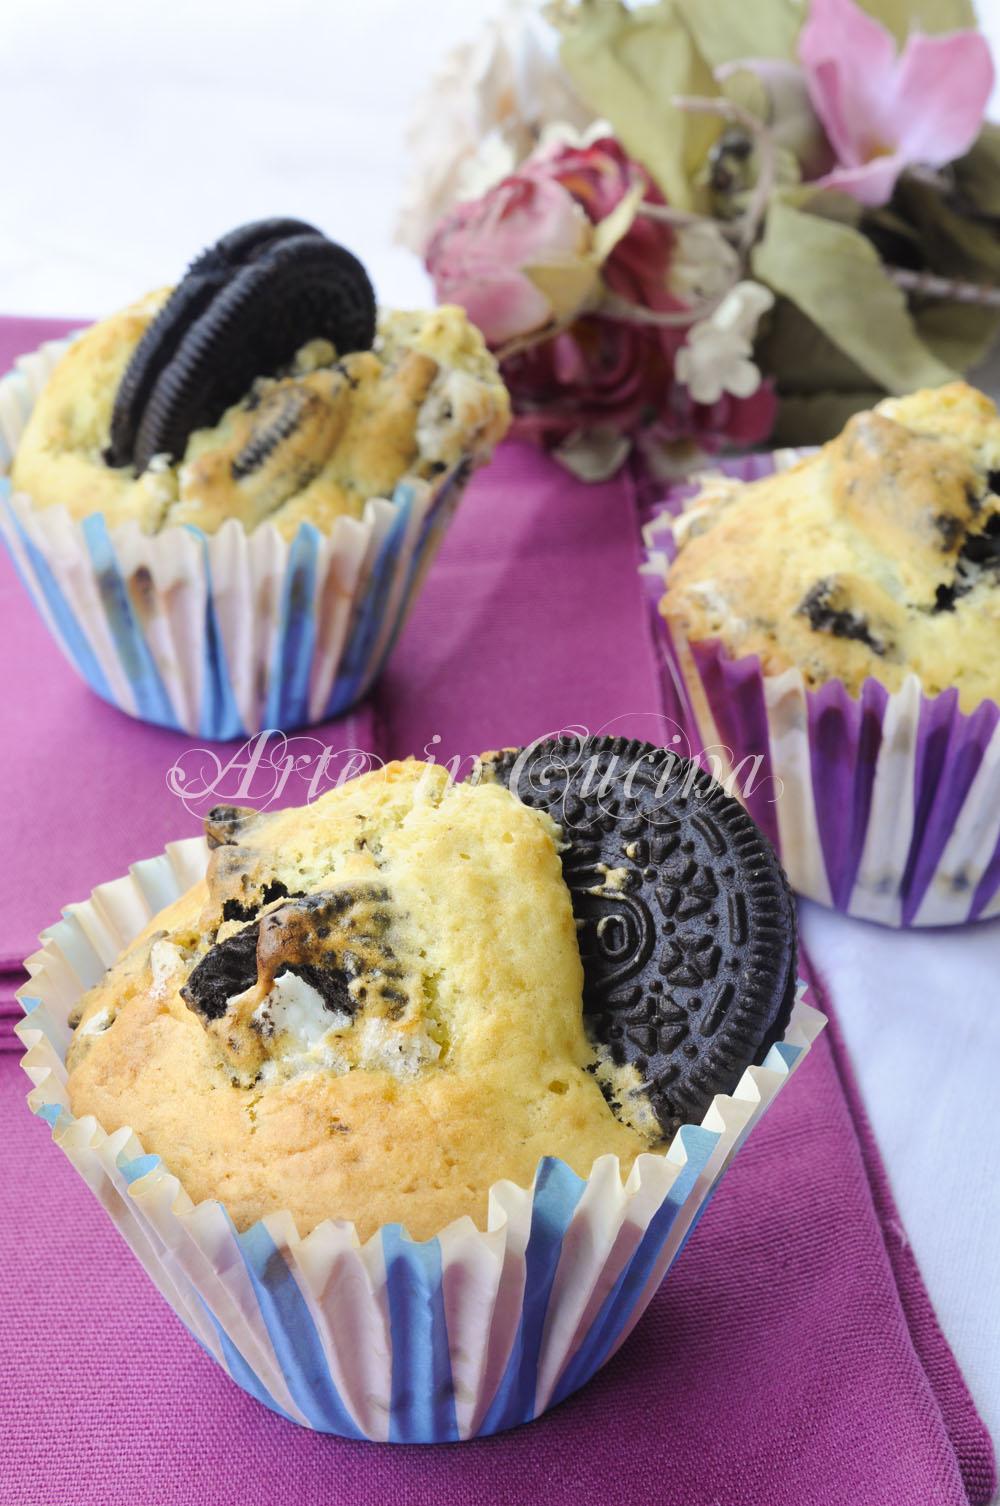 muffin-oreo-mascarpone-ricetta-veloce-2